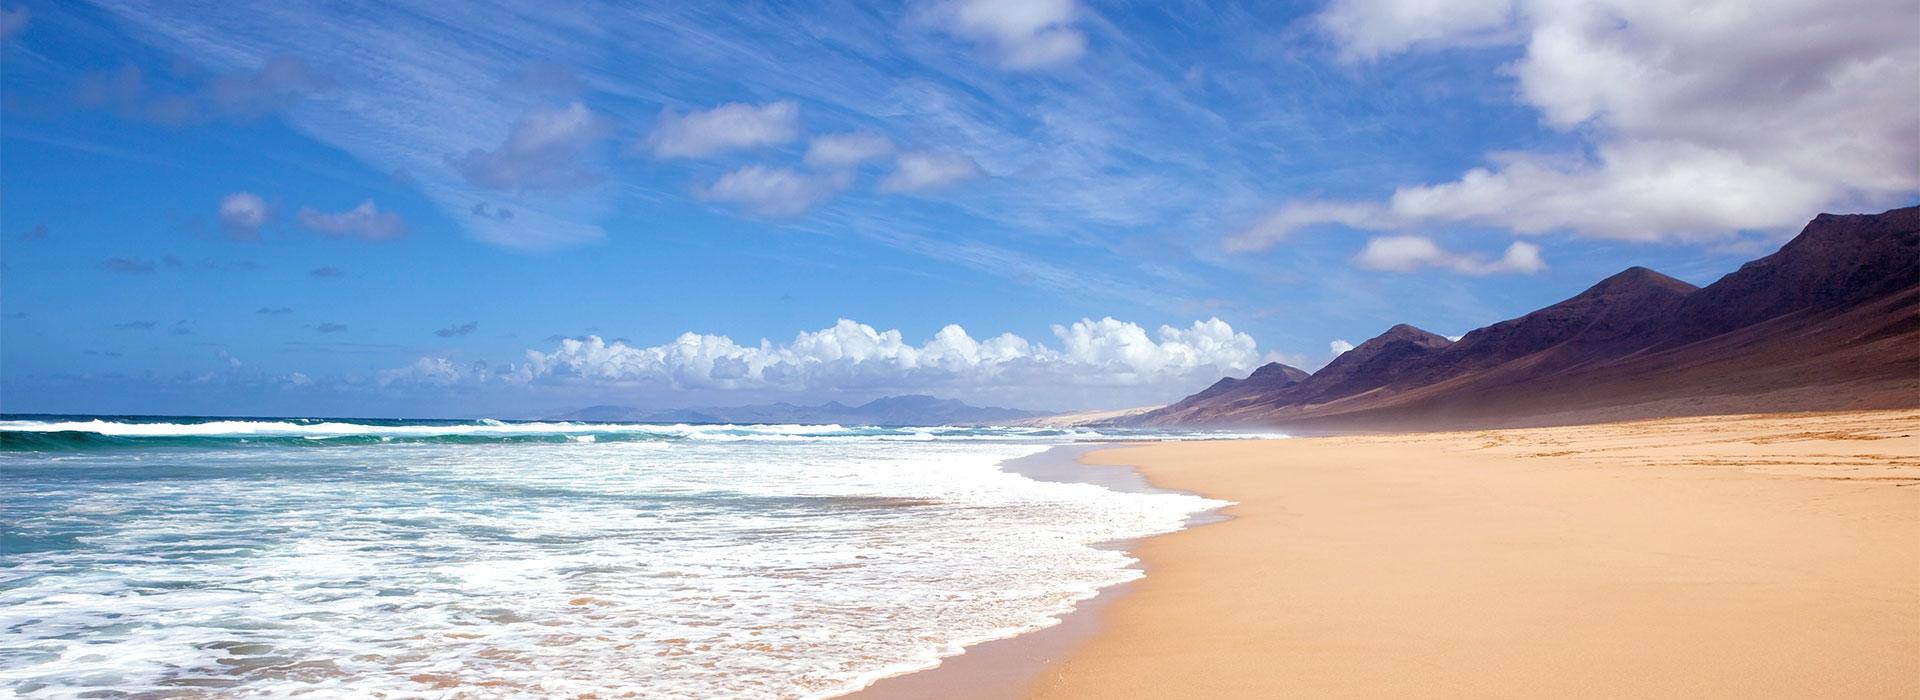 Agence de voyages Fuerteventura